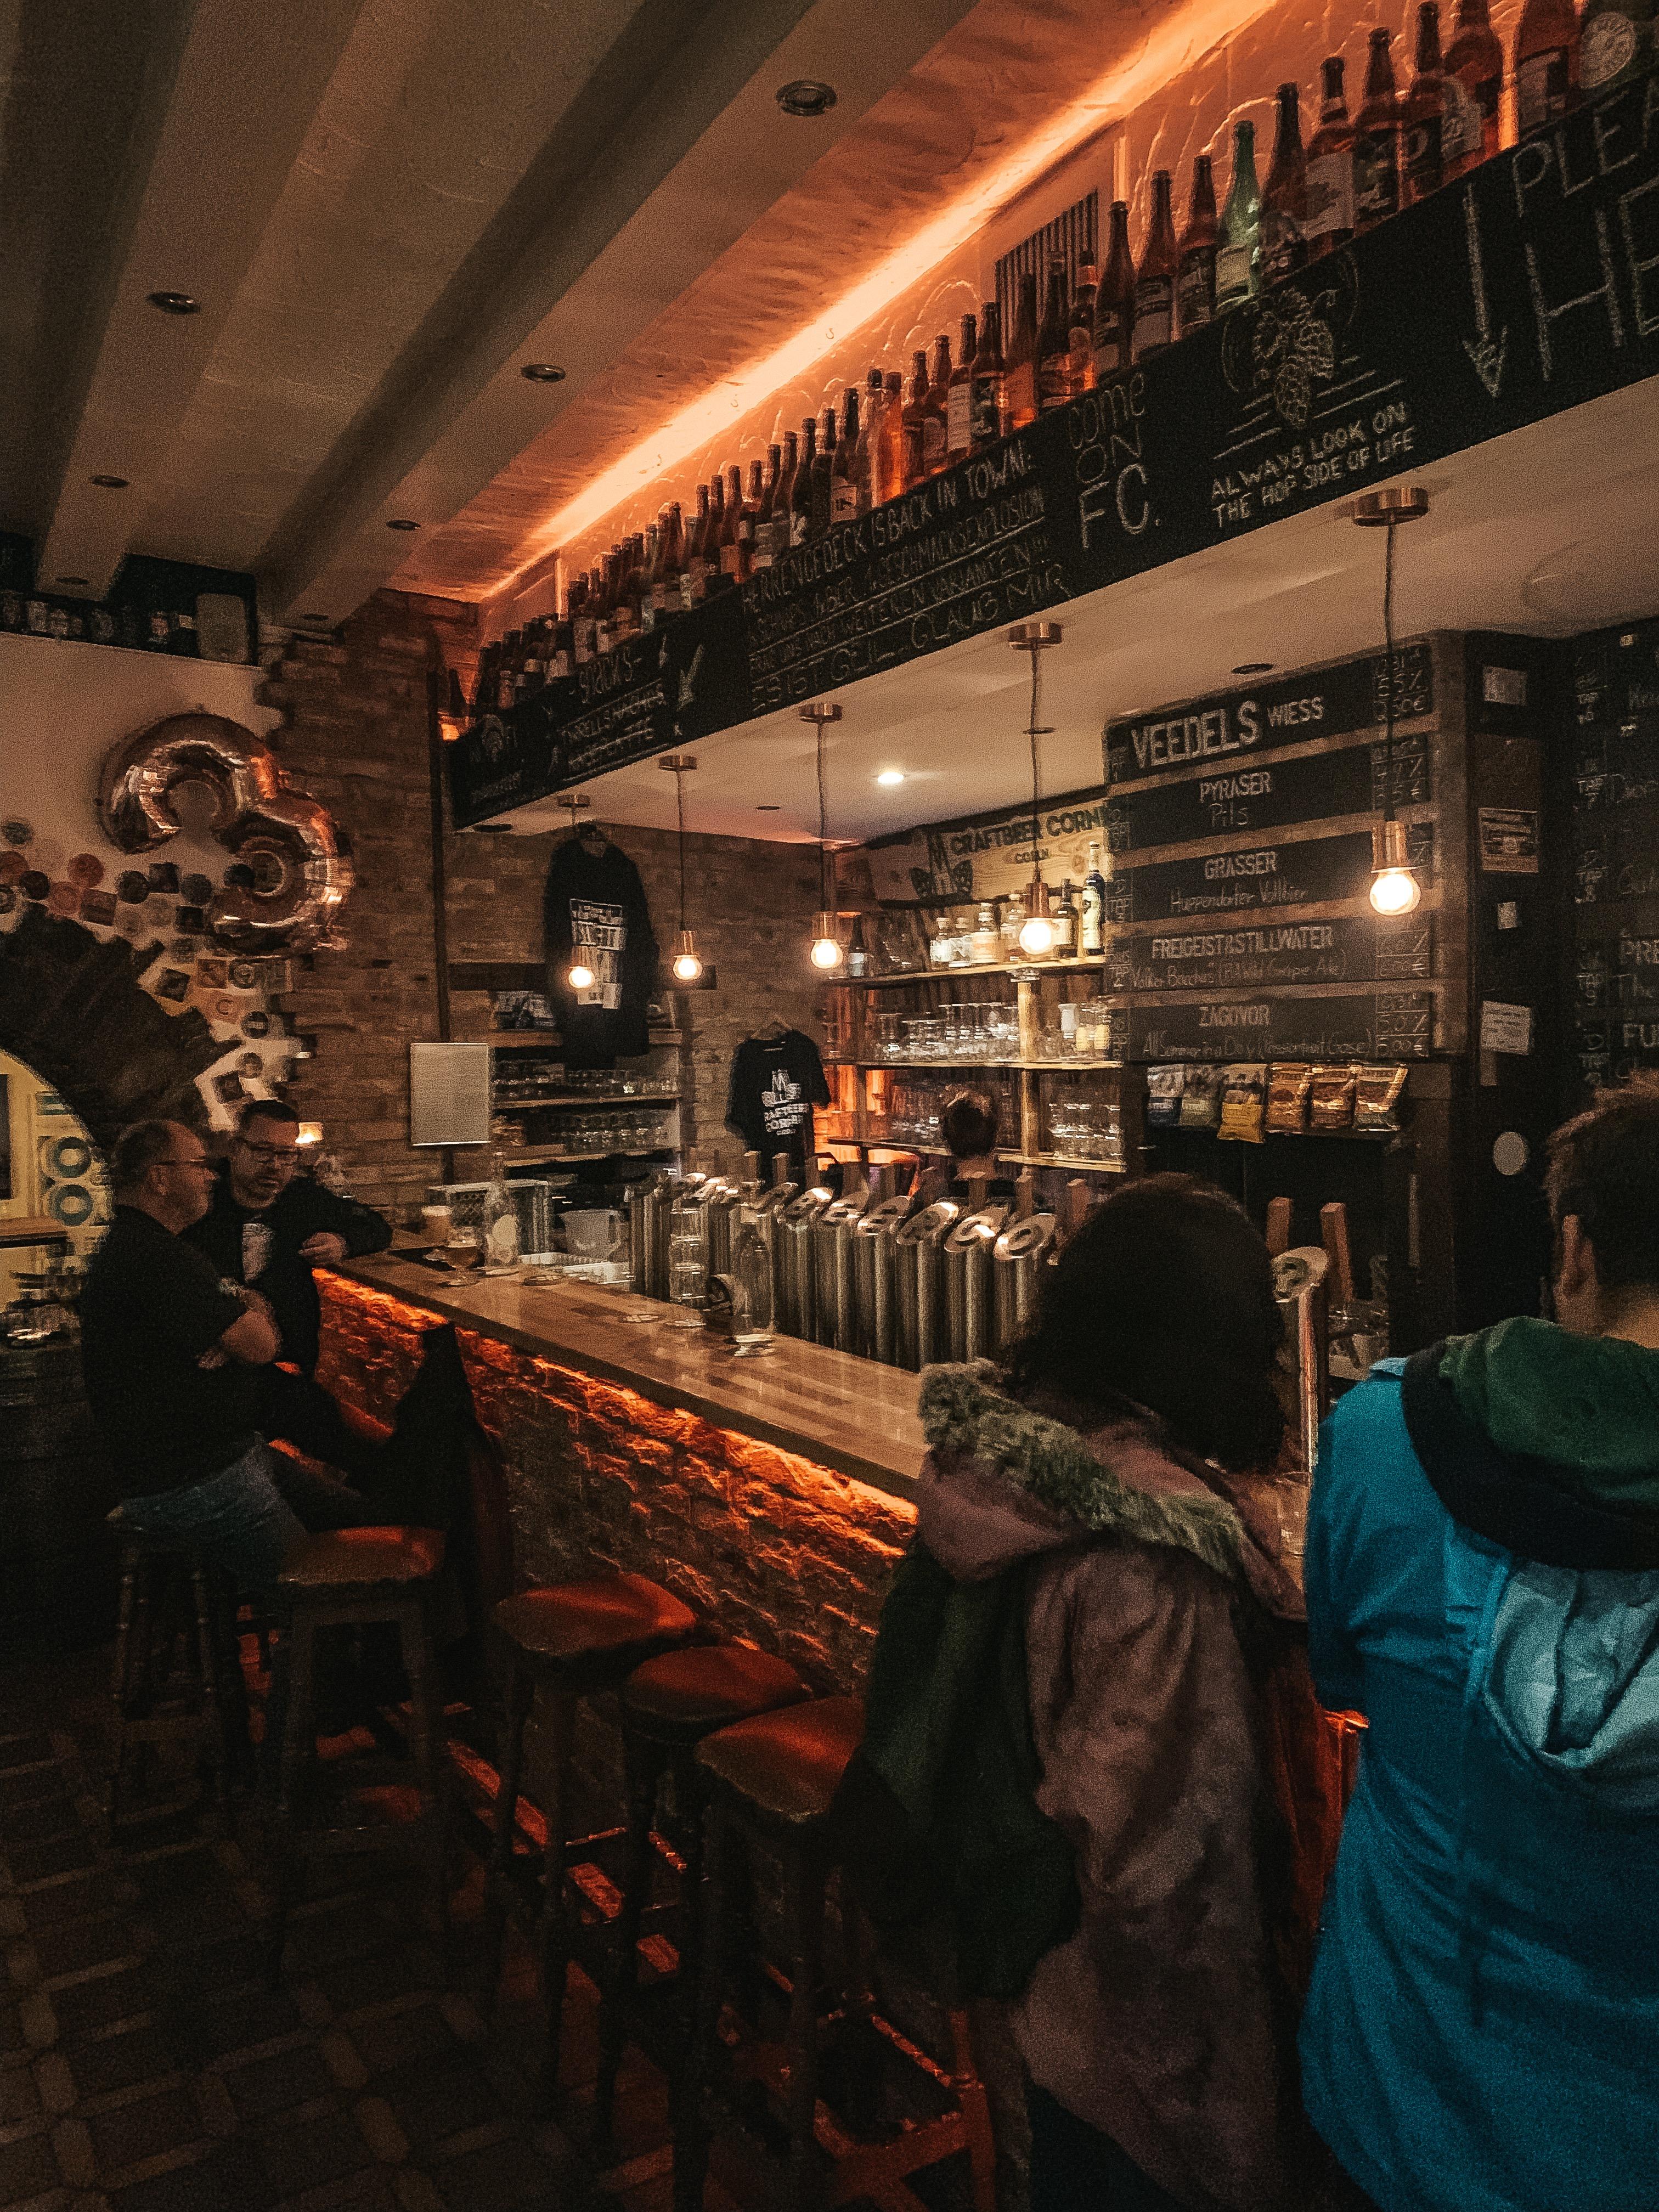 The Craftbeer Corner bar!